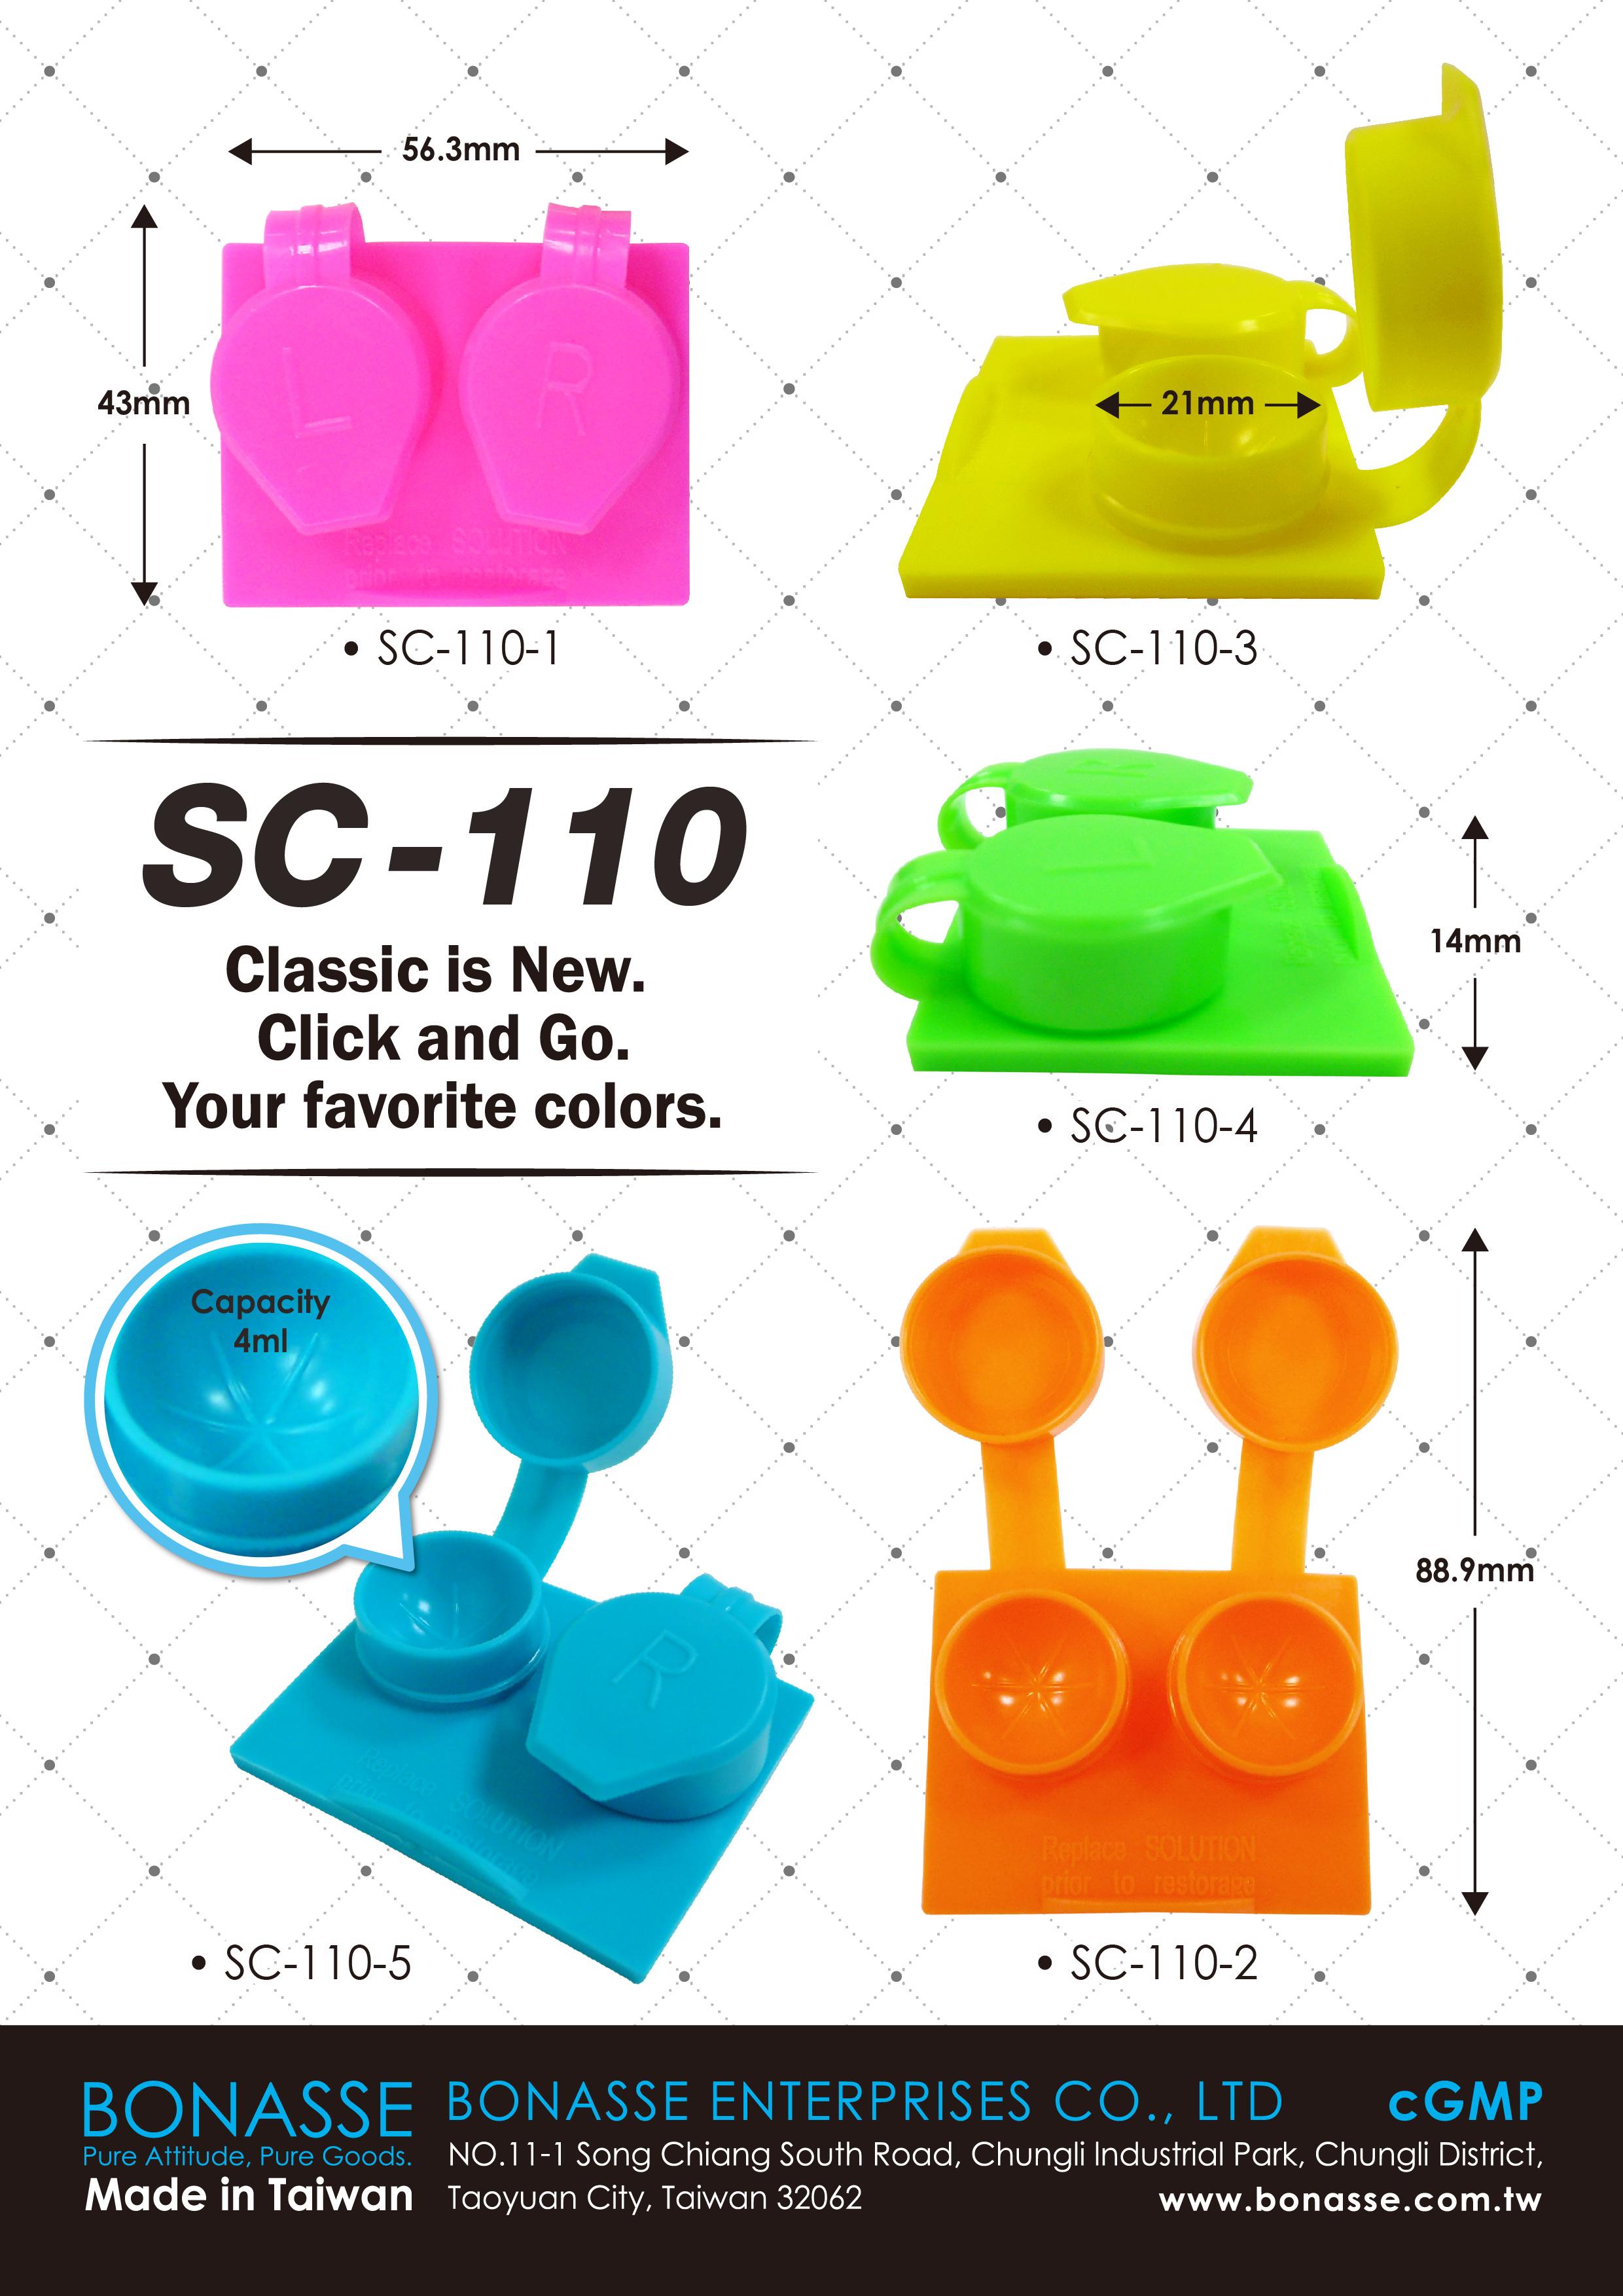 SC-110